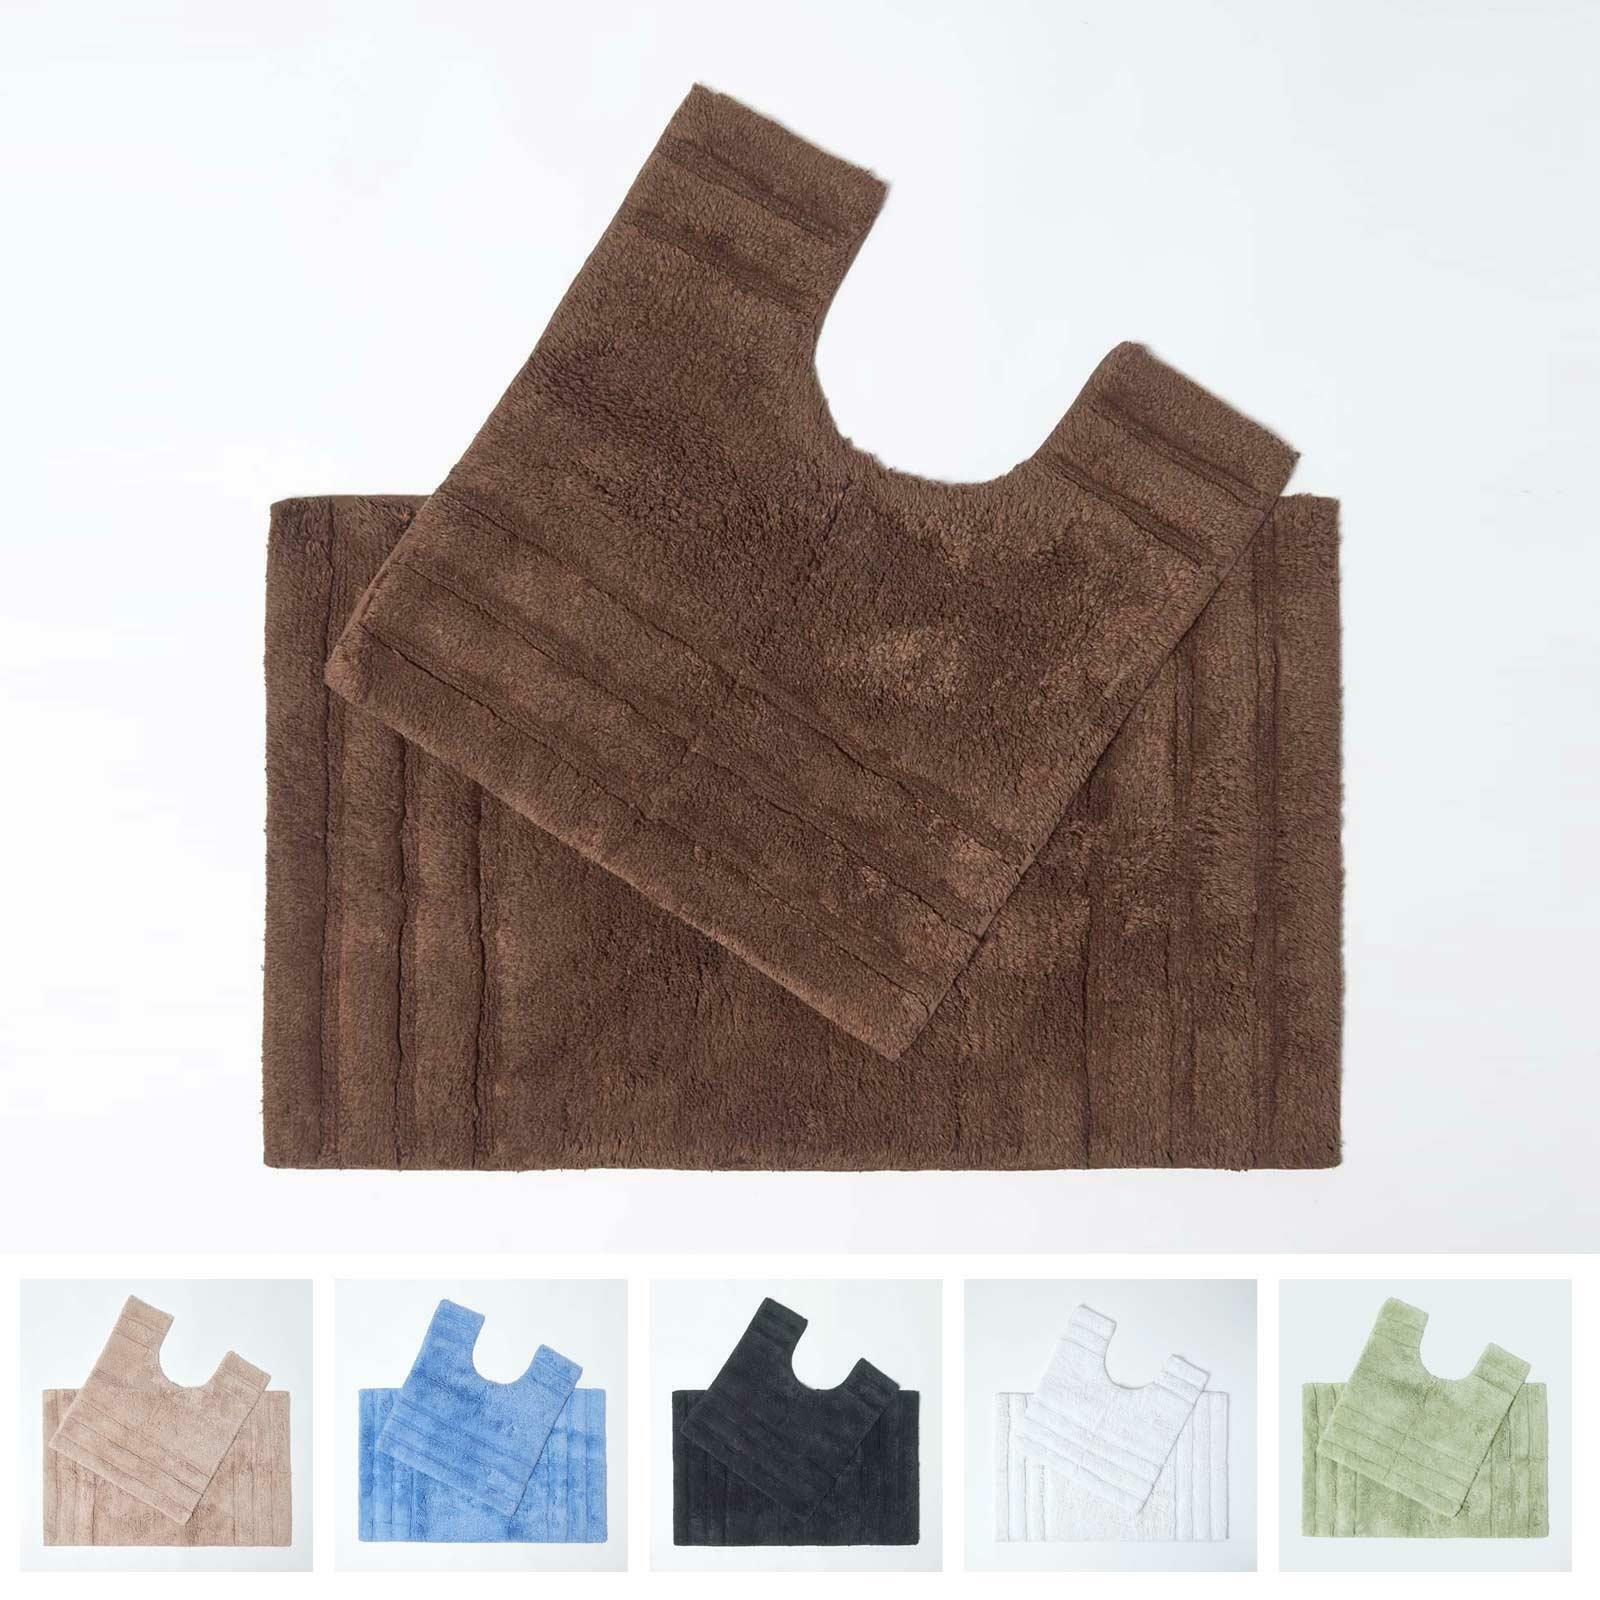 Bath Mats and Pedestal Set Non Slip Super Soft 100% Cotton Washable Spa Supreme